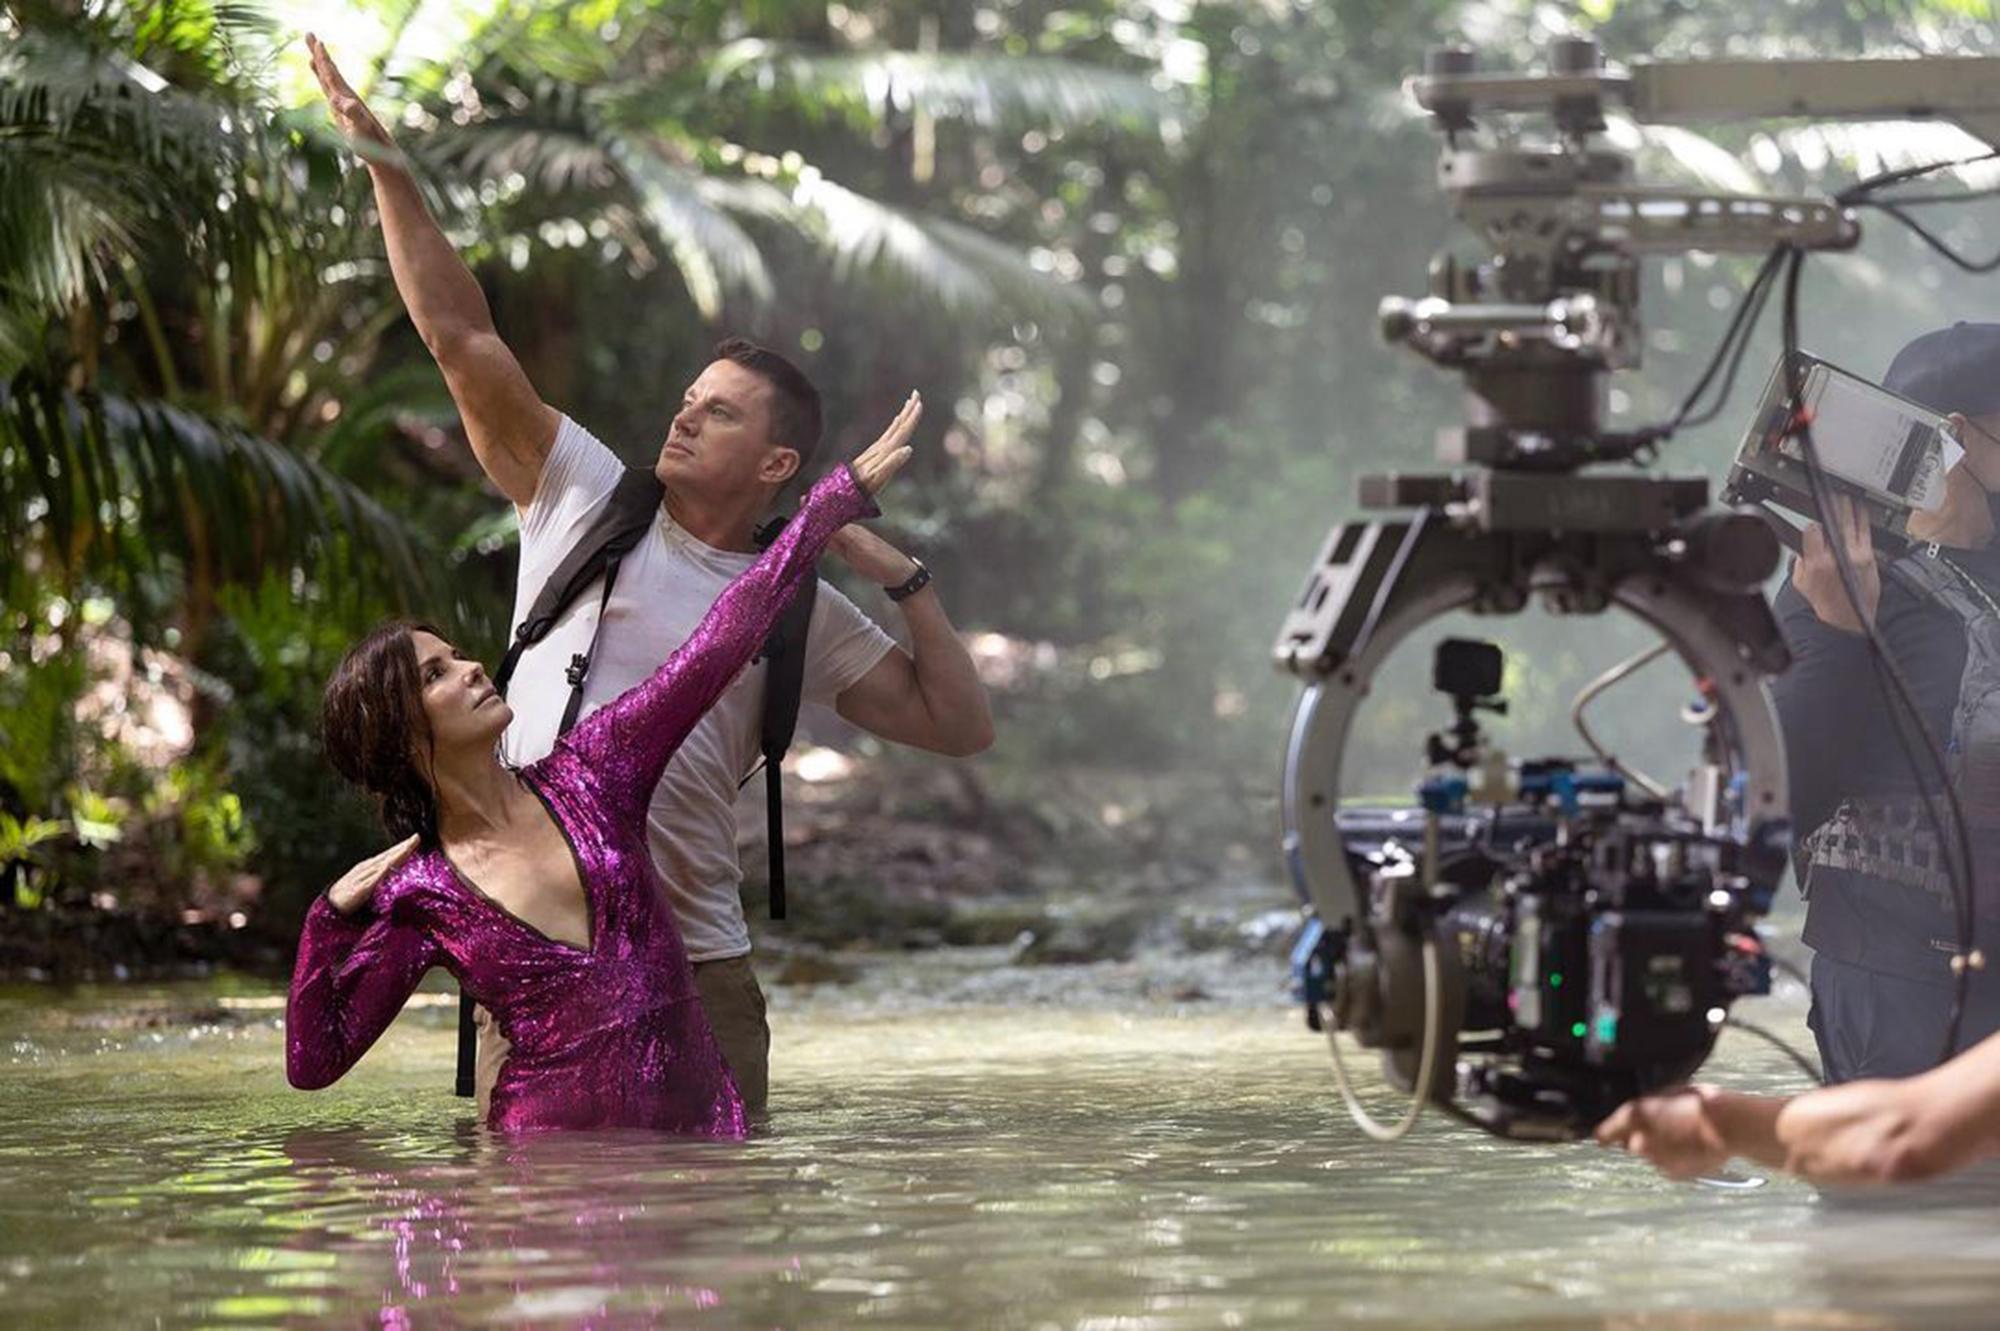 Lost City of D Channing Tatum and Sandra Bullock